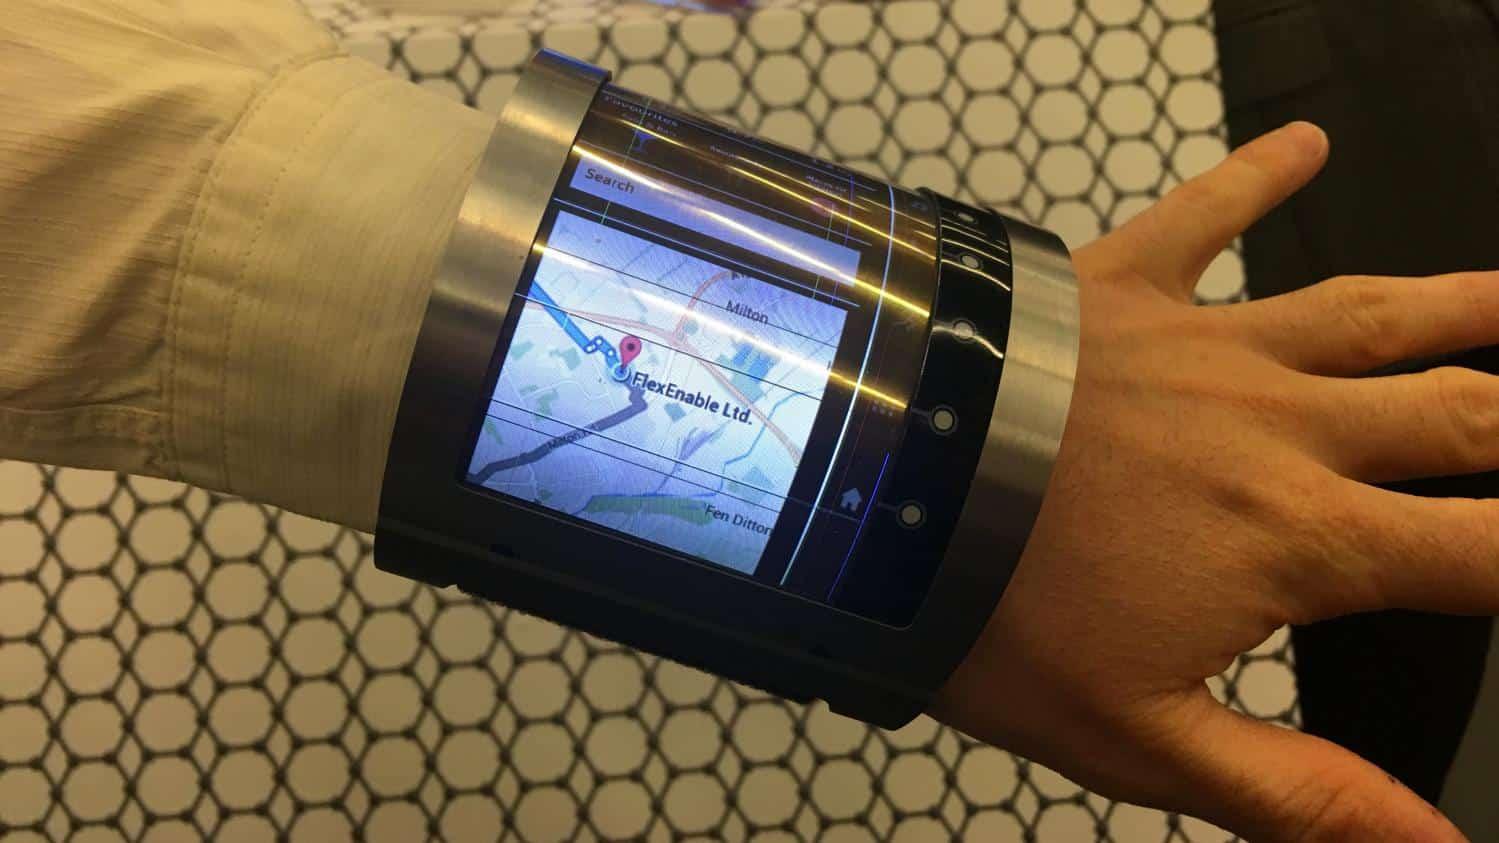 Un smartphone à écran flexible à la main